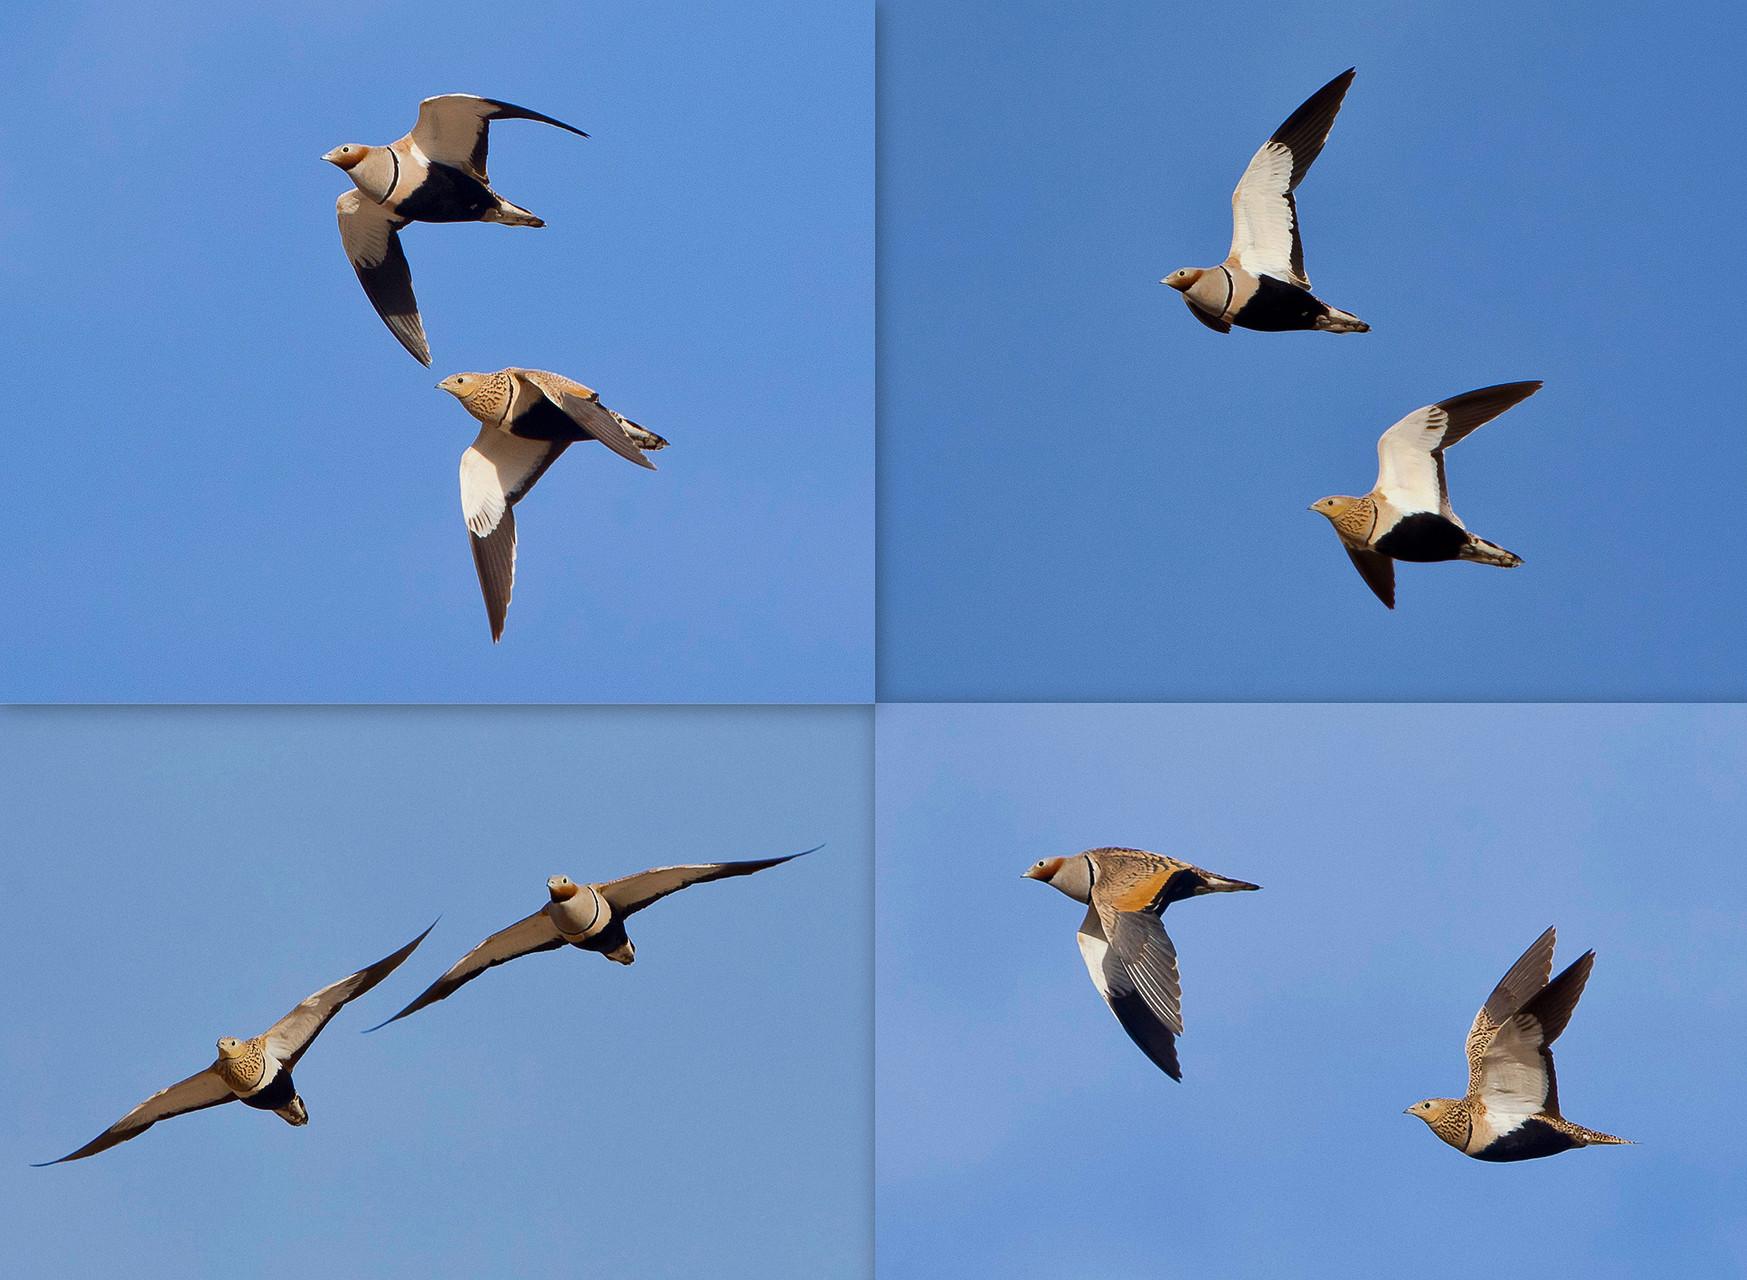 Sandflughuhn-Paare fliegen oft im fast perfekten Synchronflug (à la Patrouille-Suisse)